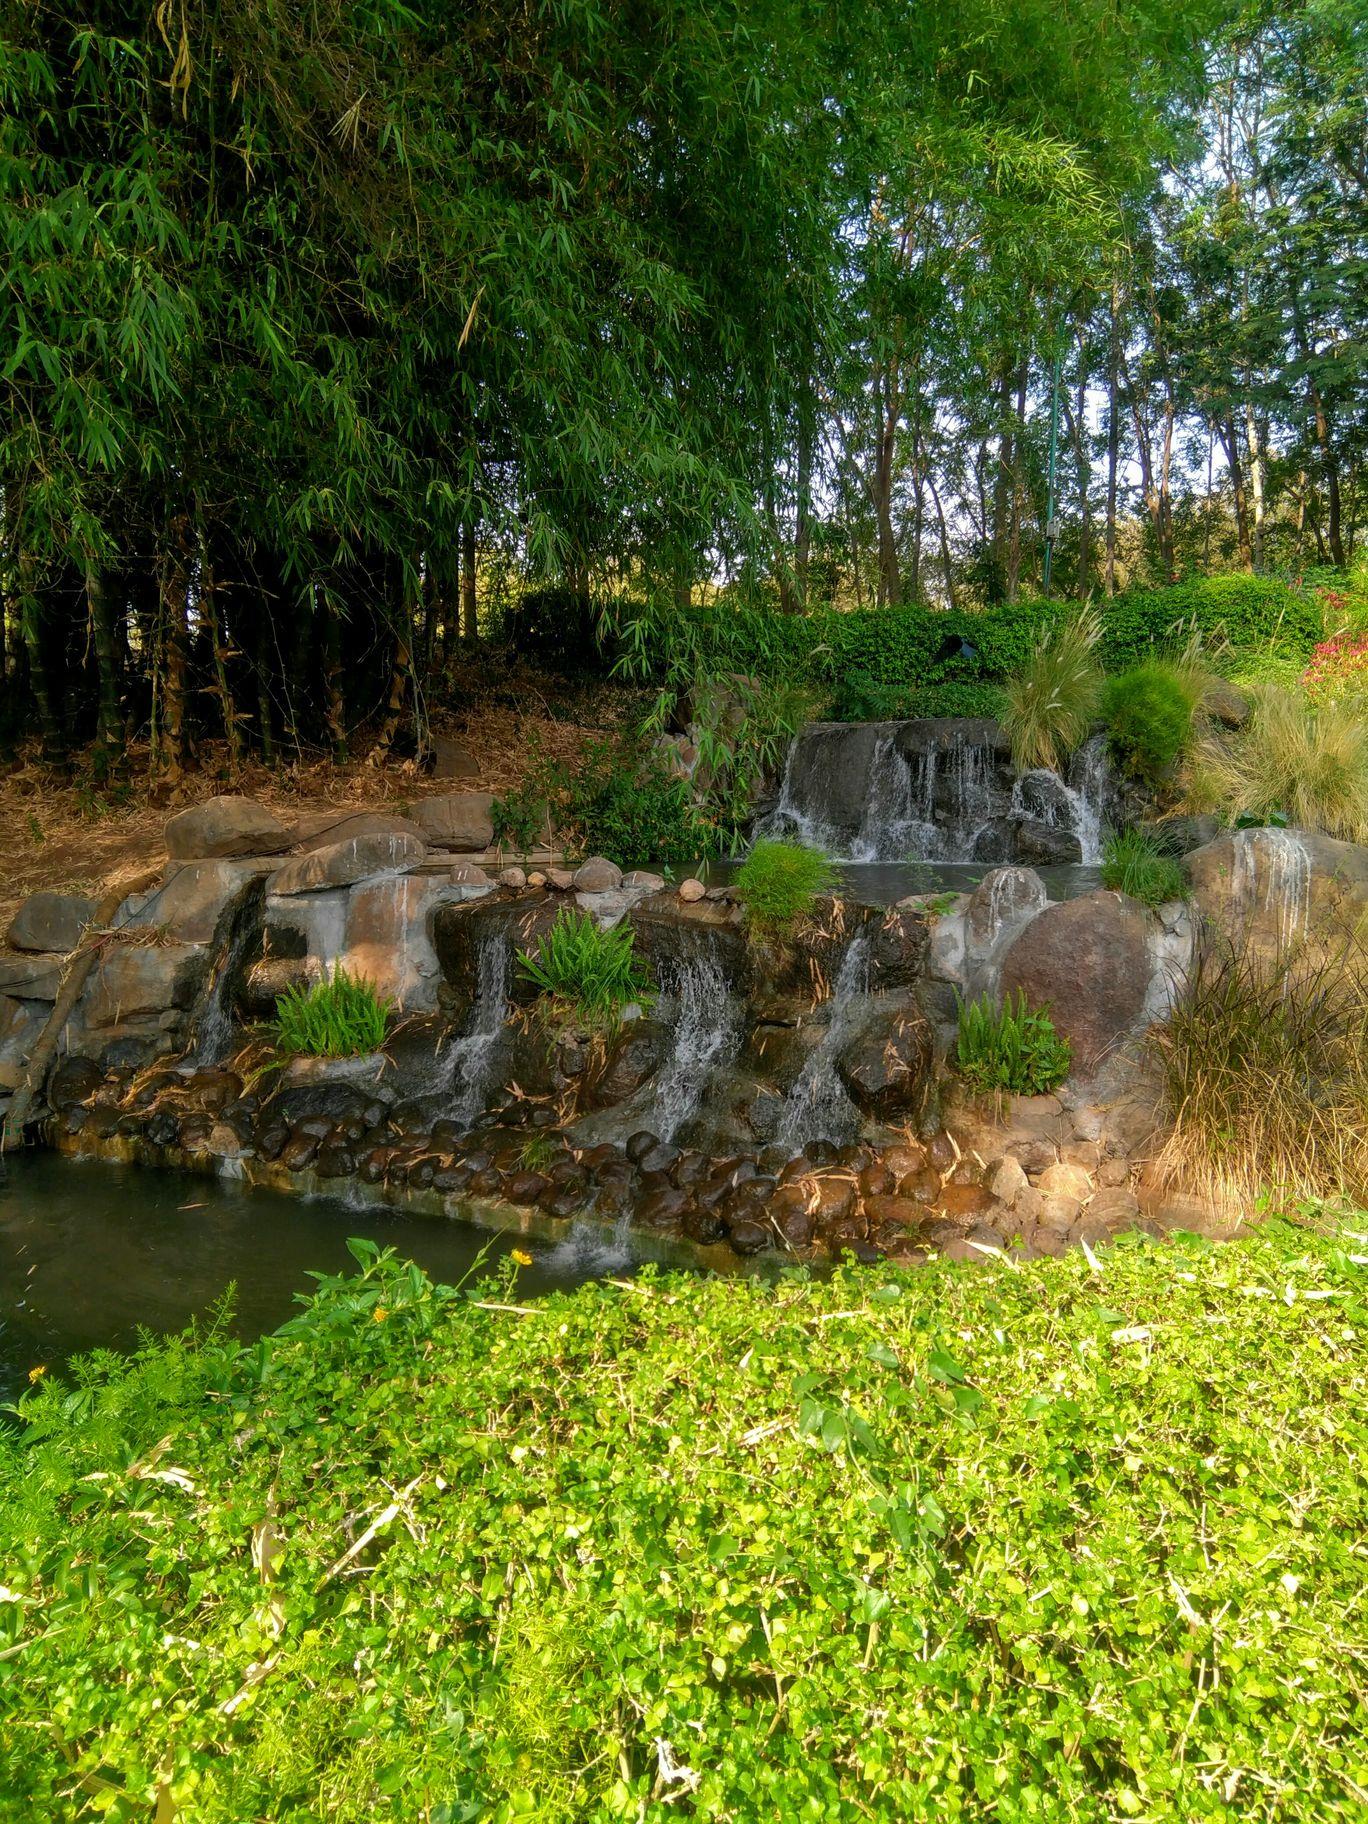 Photo of Pune-Okayama Friendship Garden By Shubham Poplai